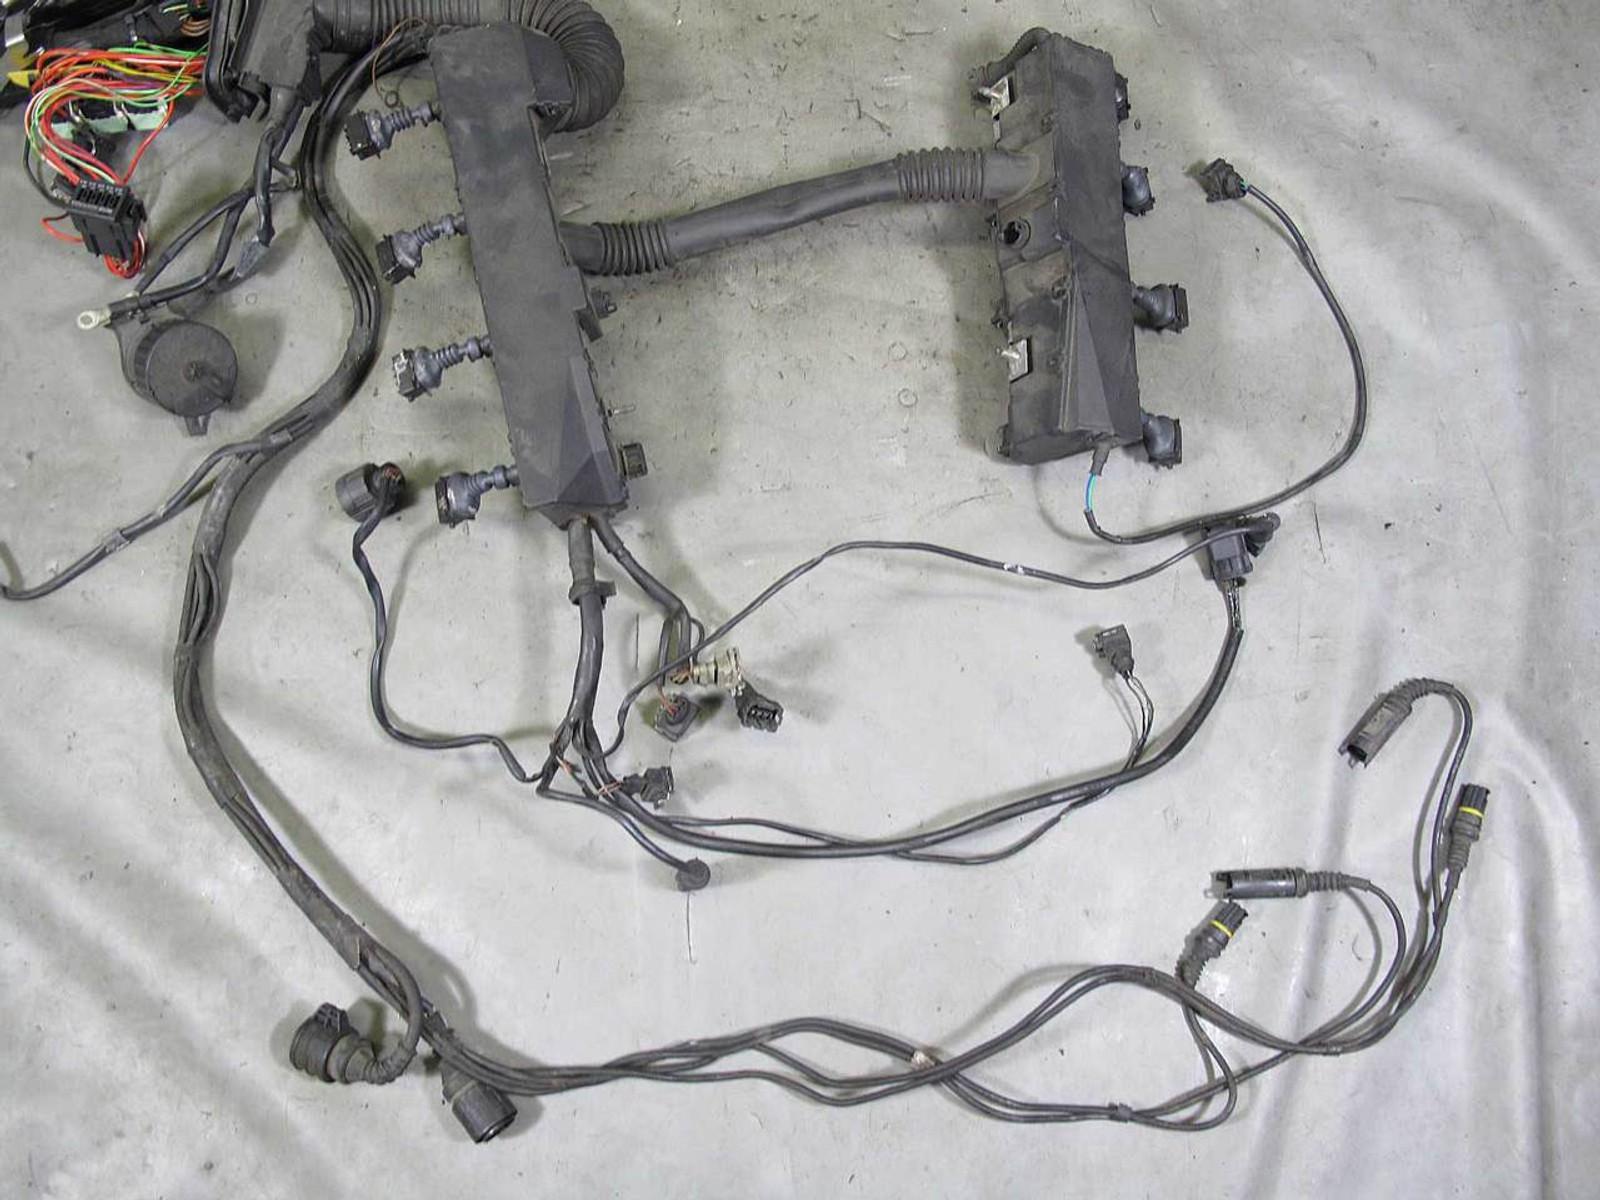 small resolution of bmw 740il engine wiring harness wiring diagram third level 1998 bmw 740il body kit 1996 1997